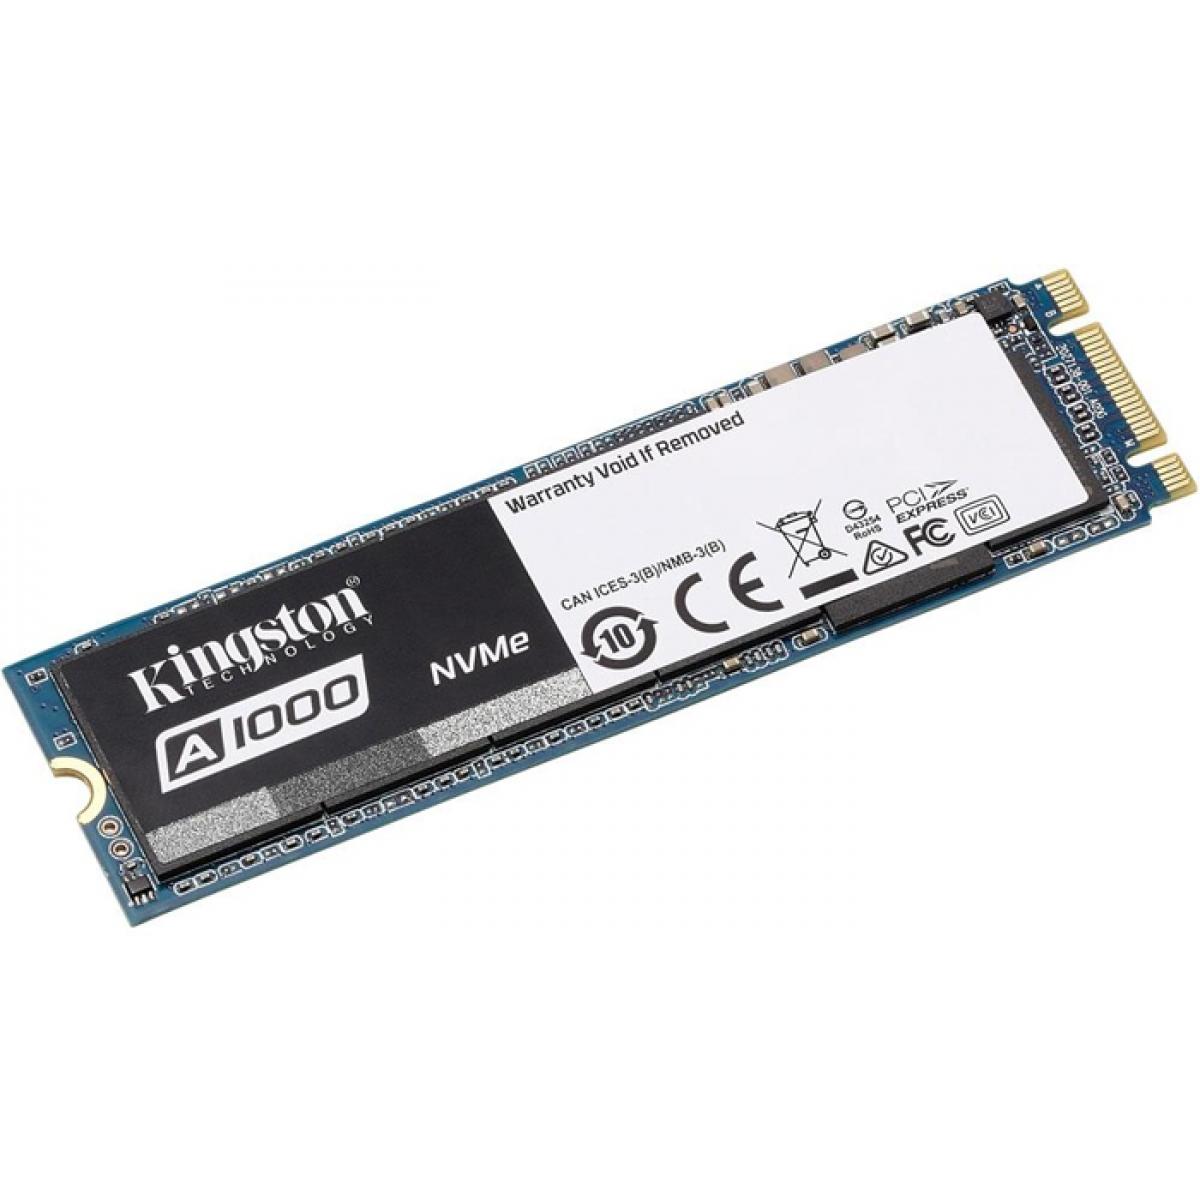 SSD Kingston A1000, 960GB, M.2 2280, NVMe, Leitura 1.500MBs e Gravação 1000MBs, SA1000M8-960G